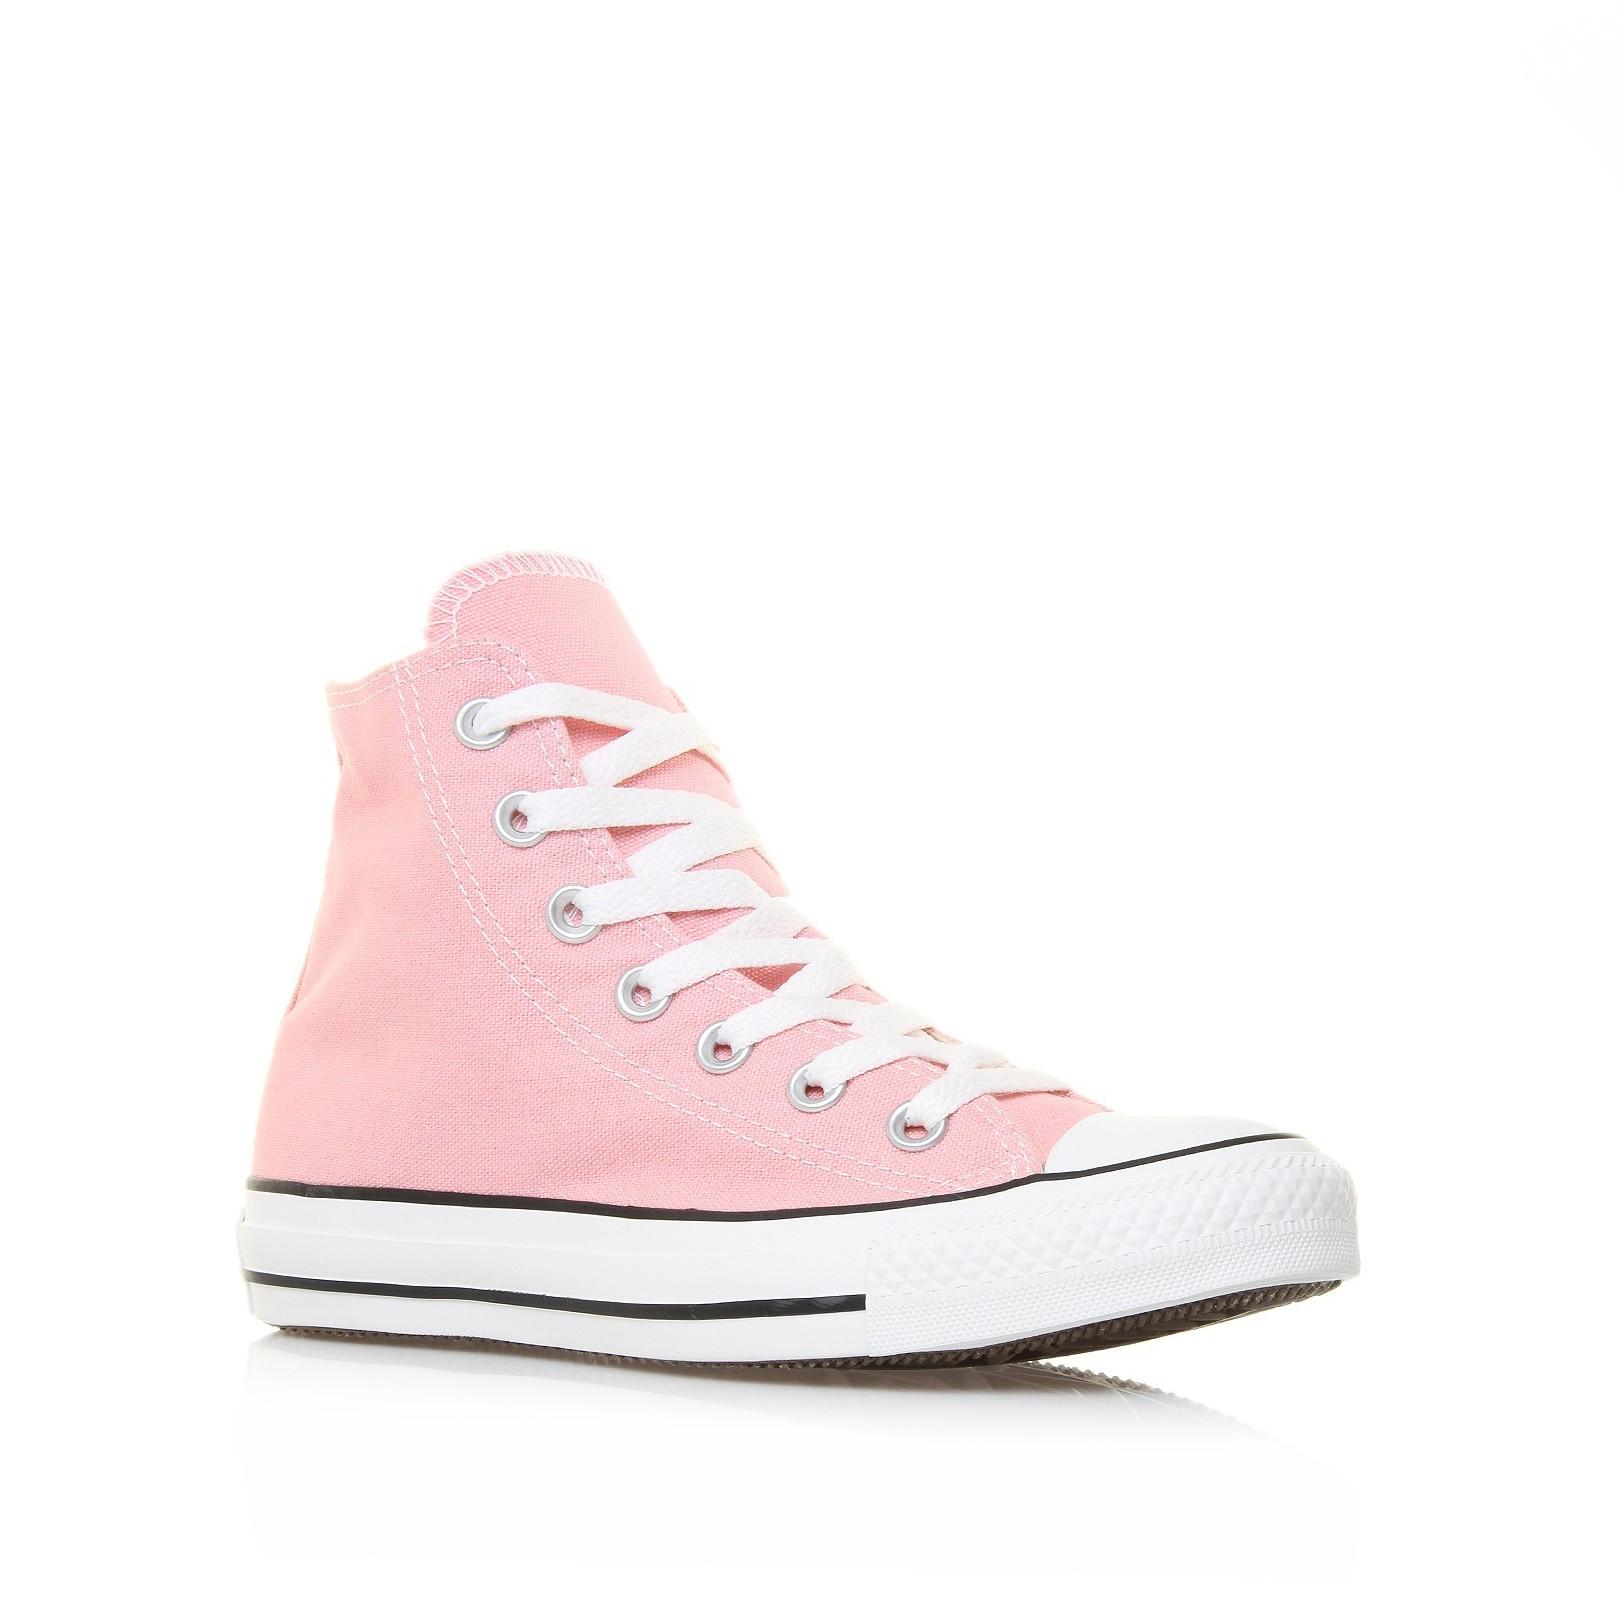 shoes, high top converse, converse, converse, pink, summer